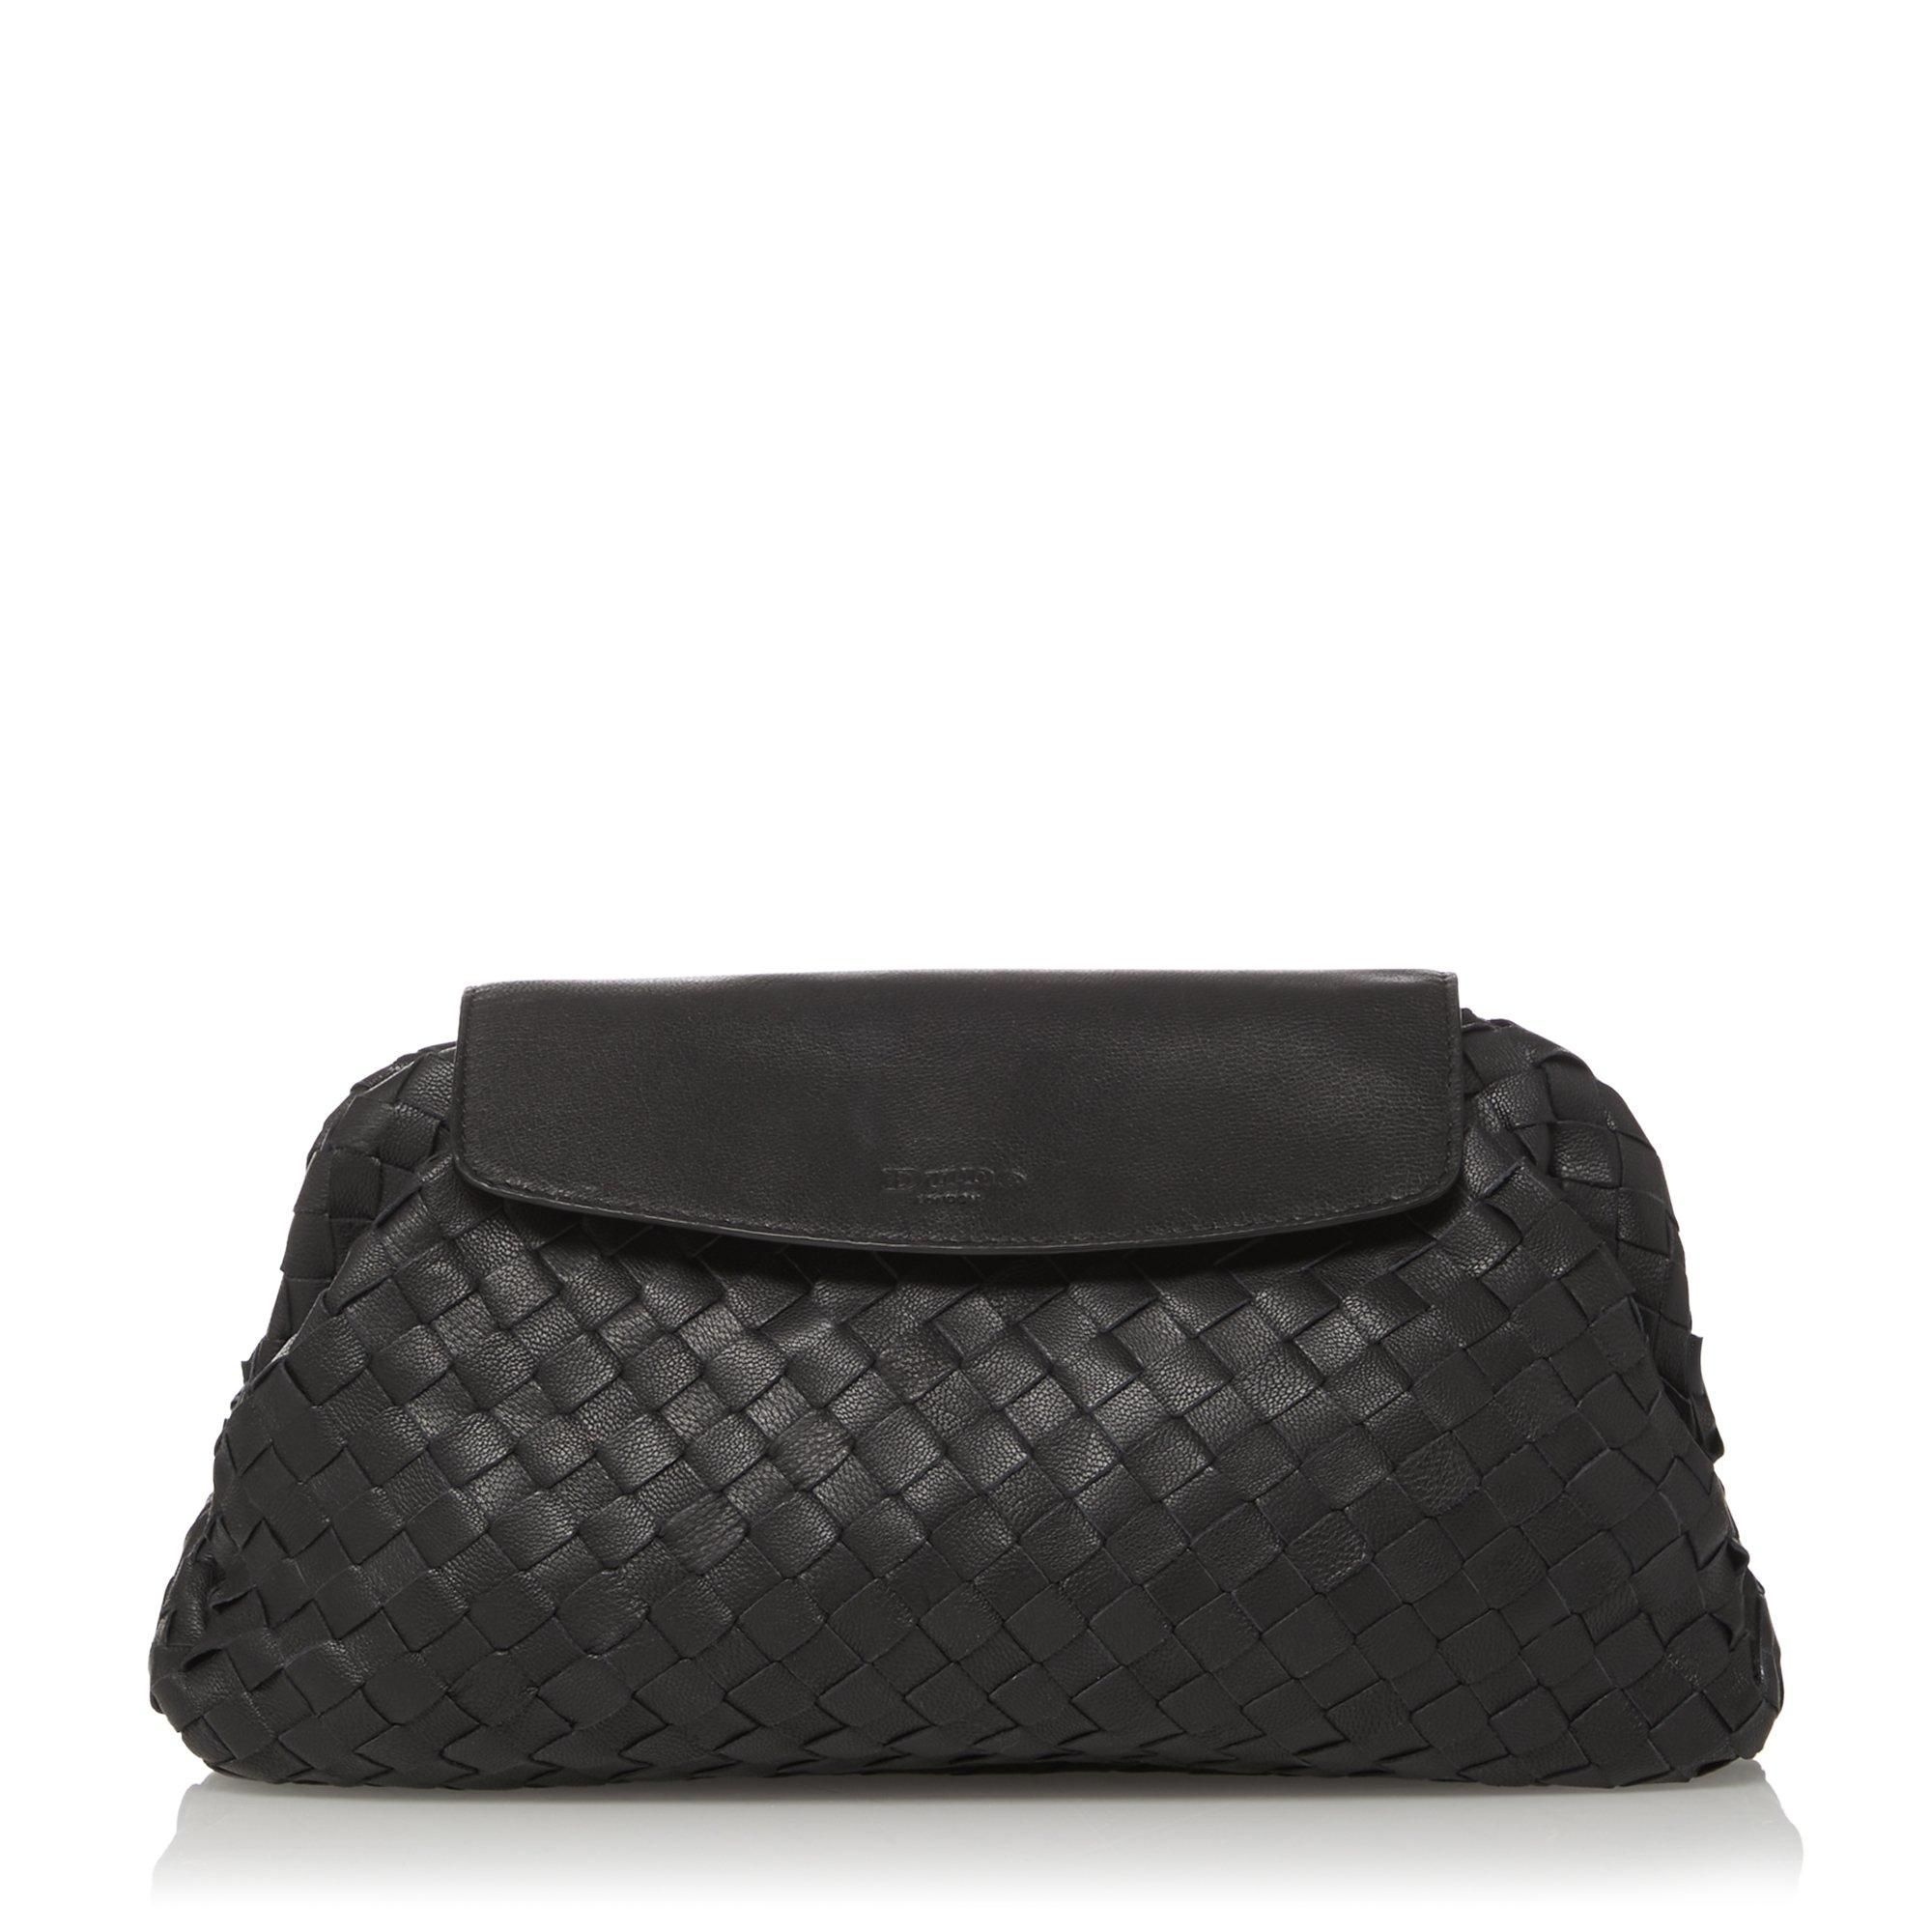 Dune EMOREE Voluminous Woven Leather Clutch Bag